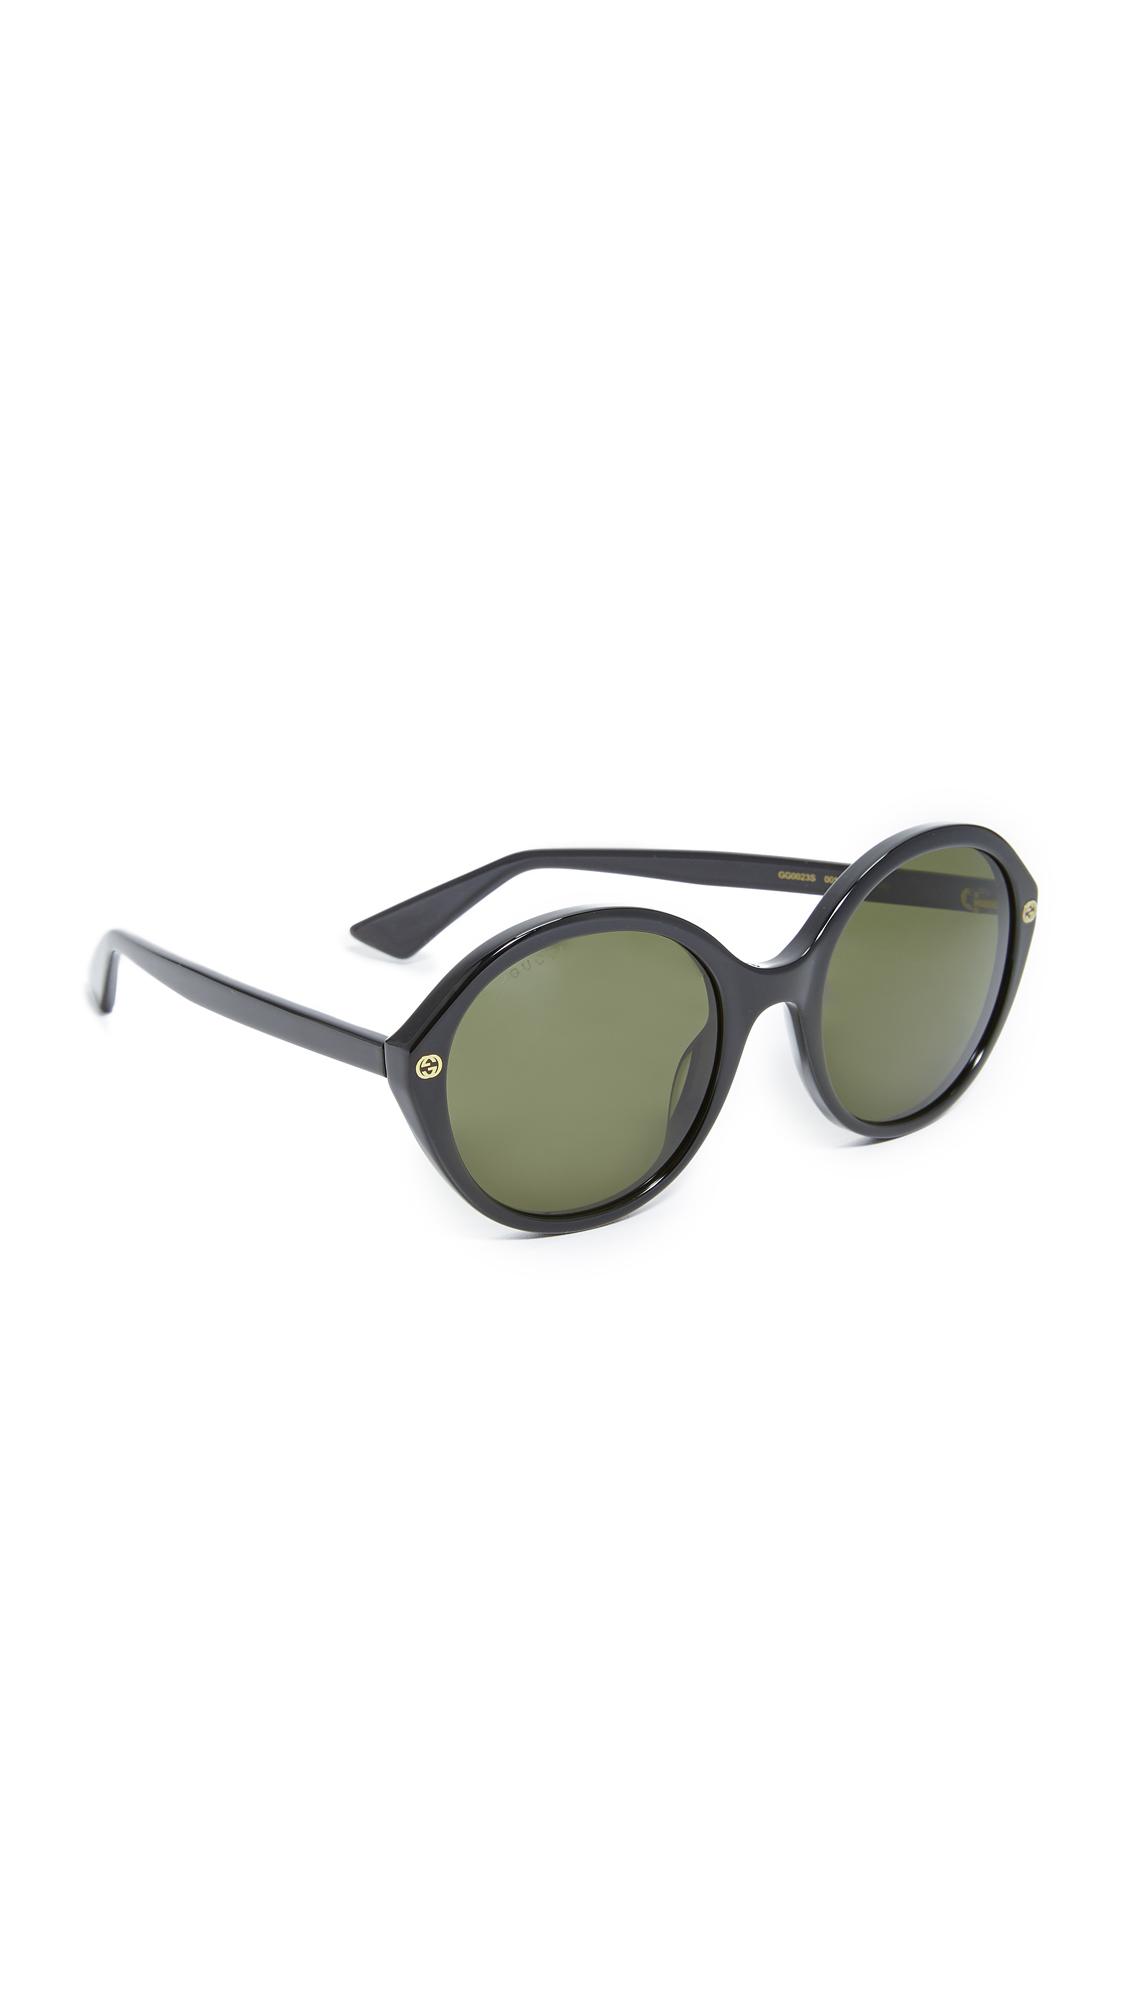 Gucci Lightness Round Sunglasses - Black/Green at Shopbop